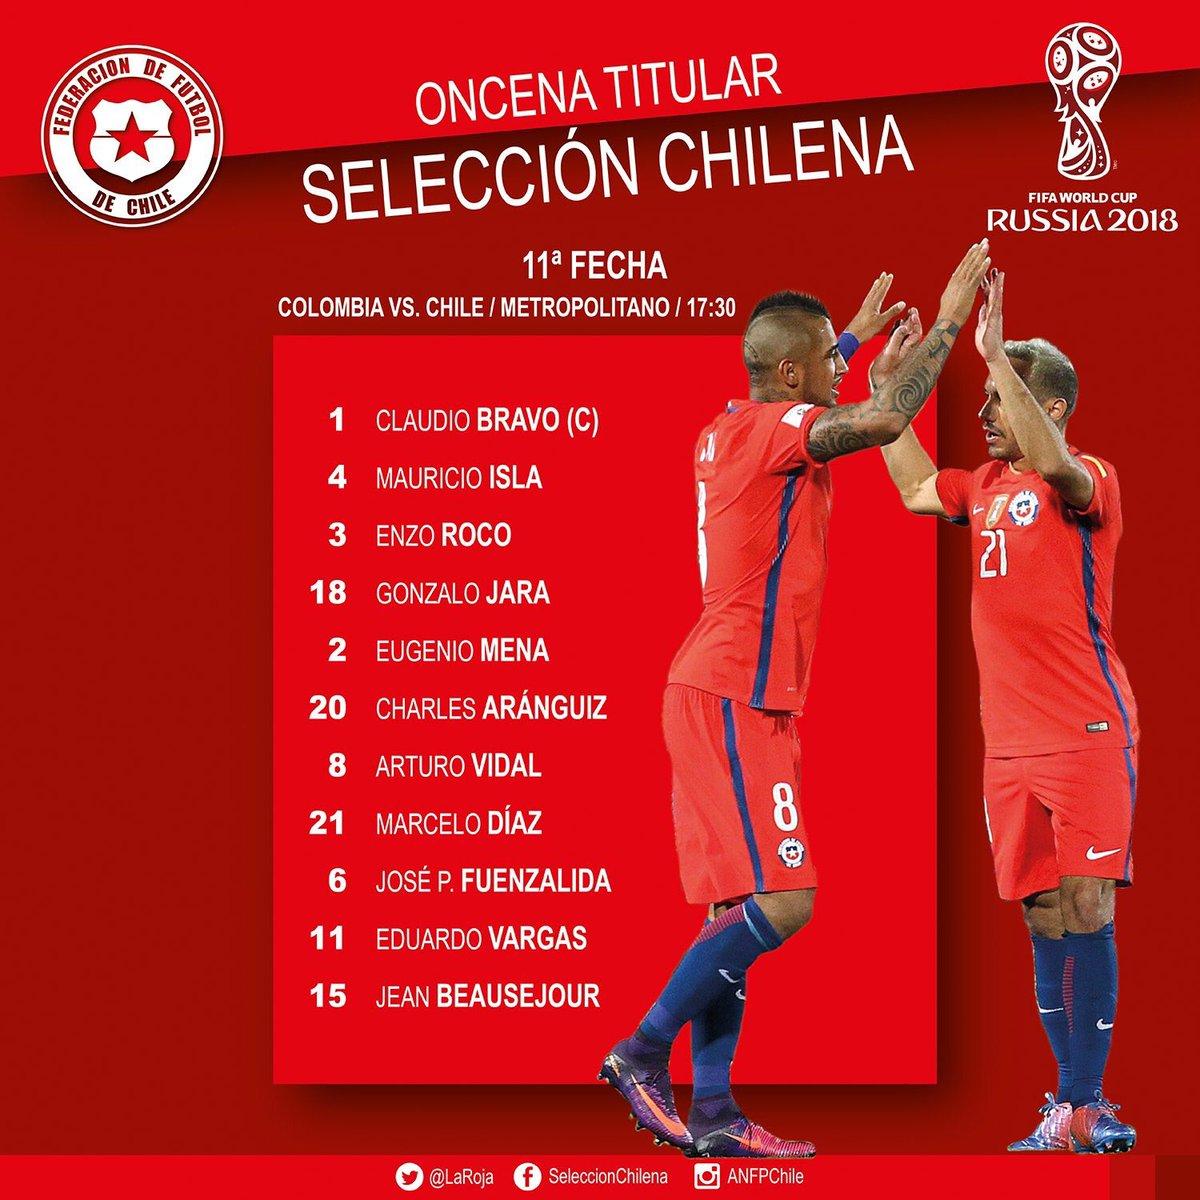 #VamosChile: Vamos Chile